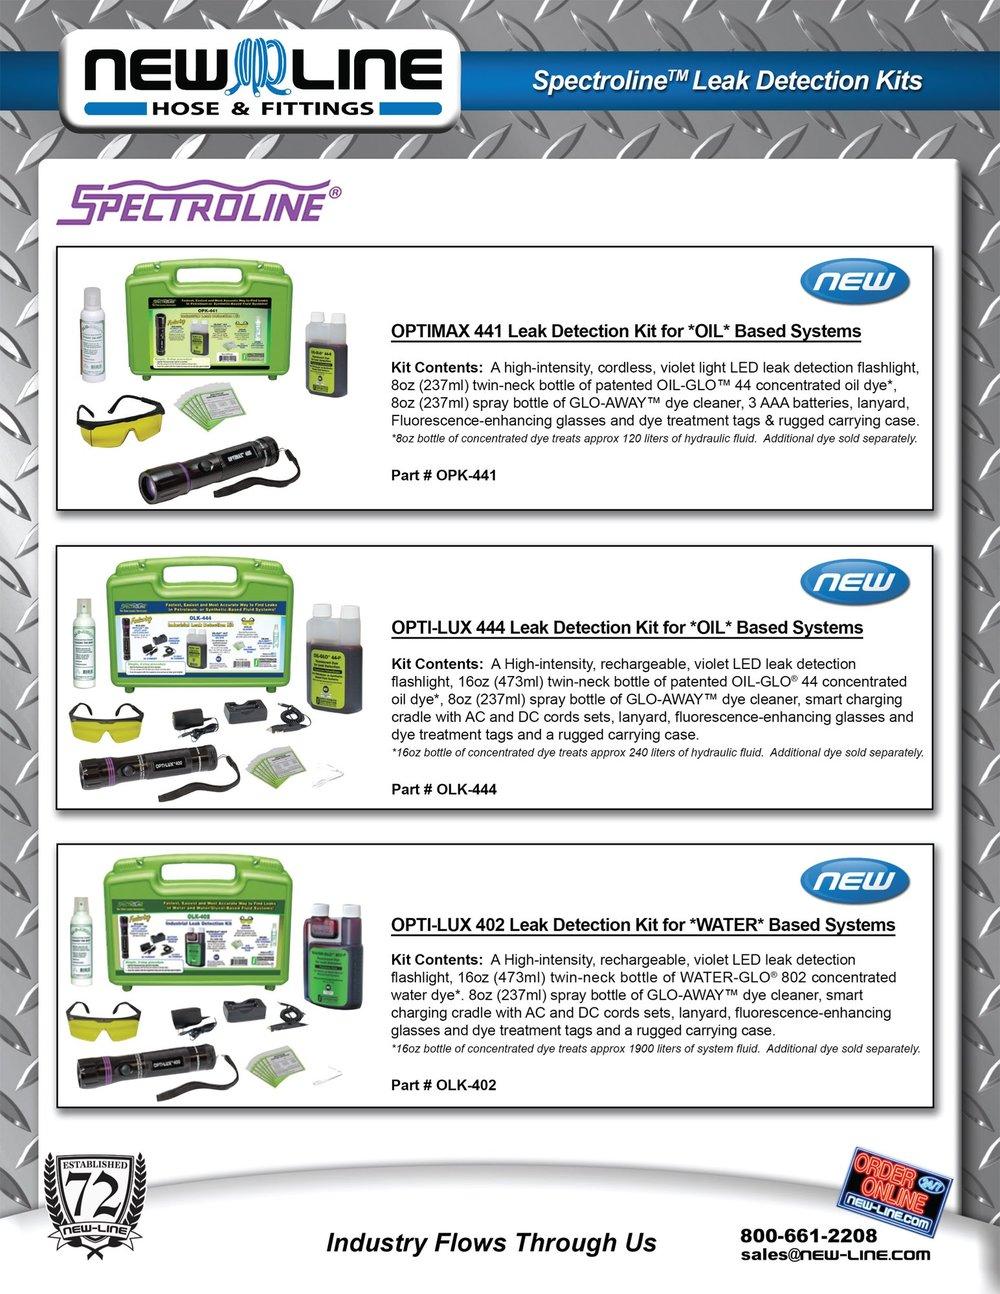 Spectroline-Flyer_COMBINED---April-29-15-2.jpg